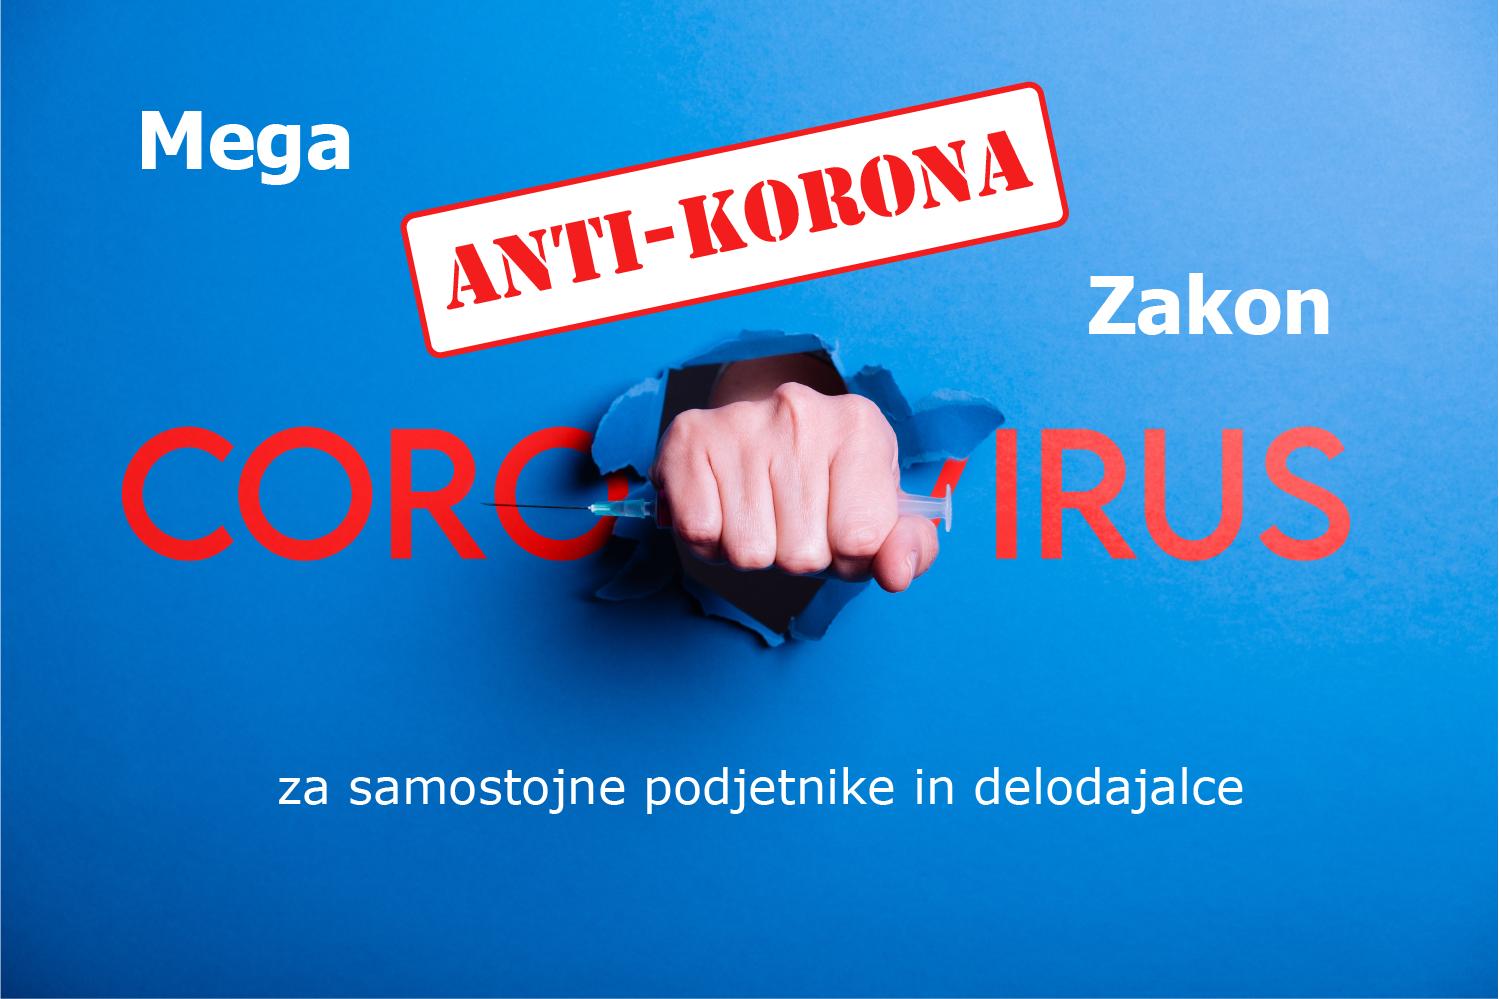 3Gloco-Mega-anti-korona-zakon